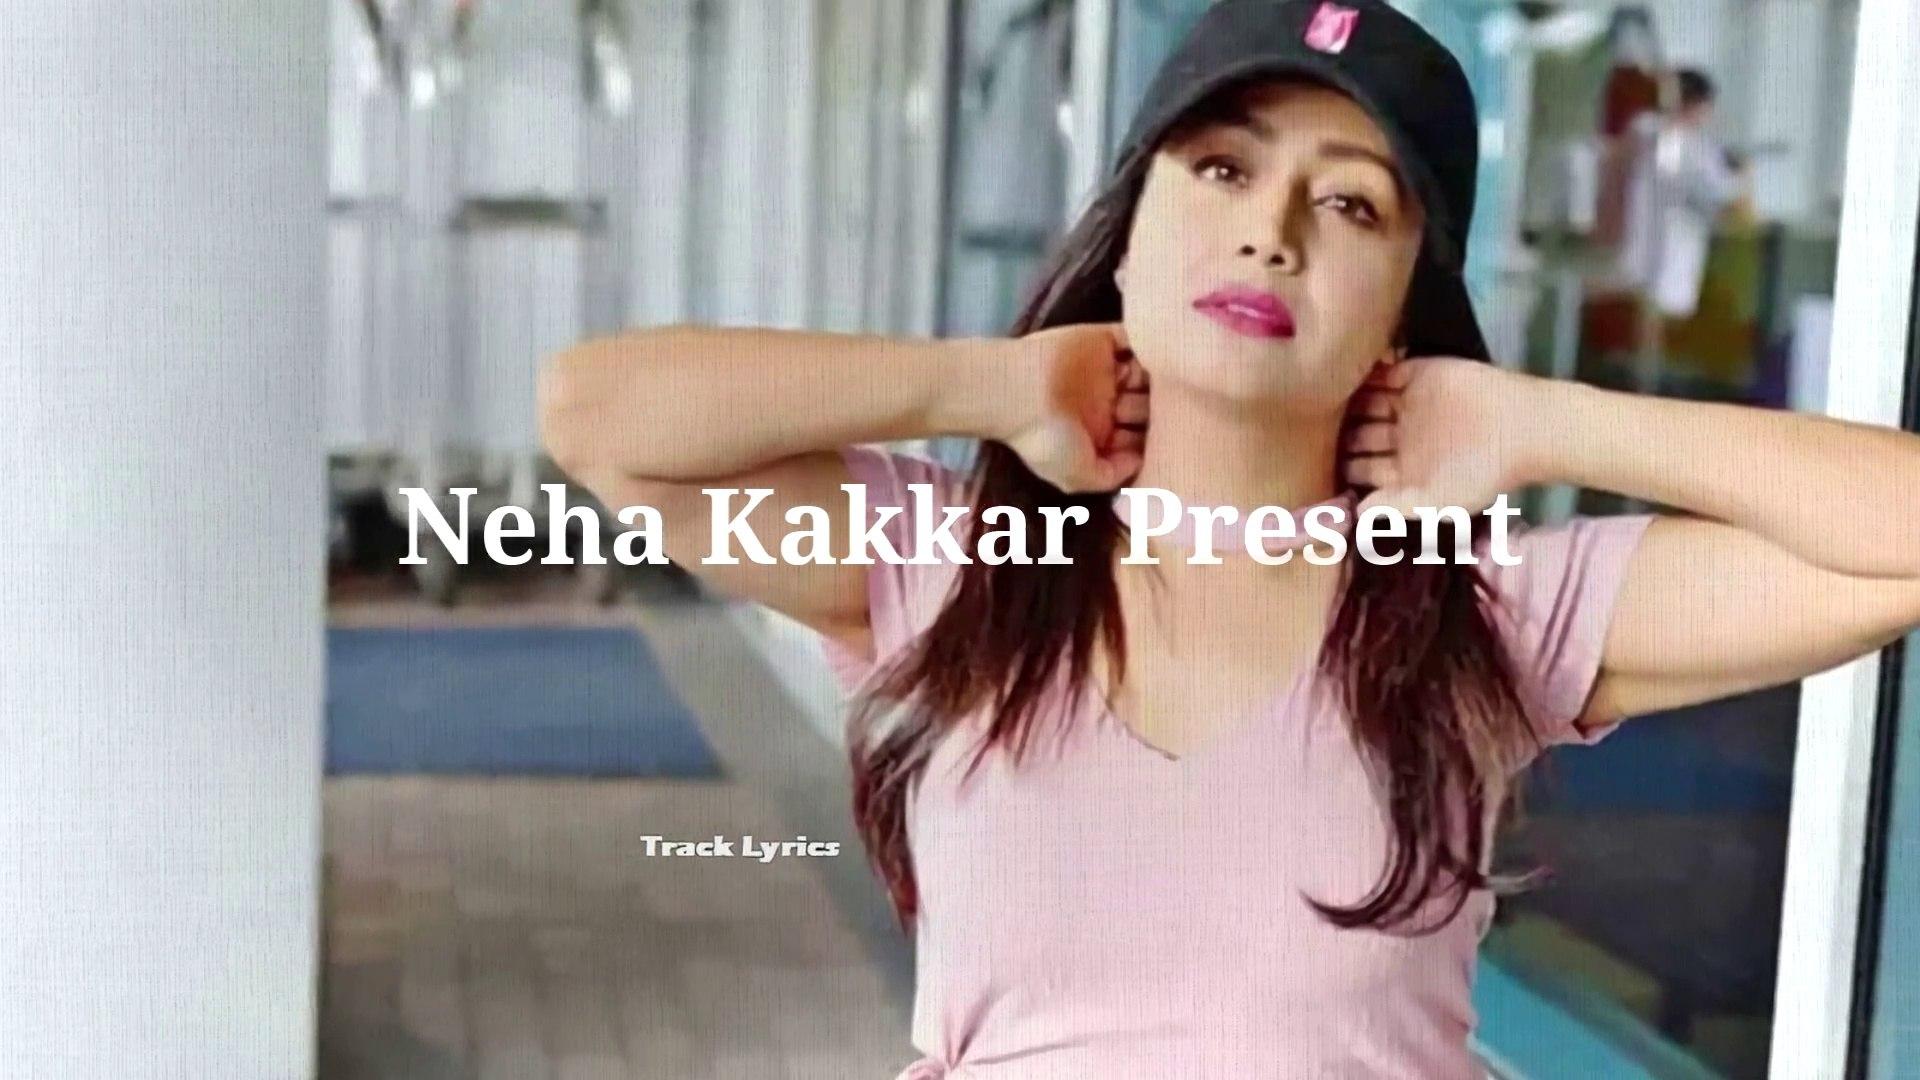 Ek Toh Kum Zindagani Nora Fatehi Neha Kakkar Promo Video Track Lyrics Video Dailymotion